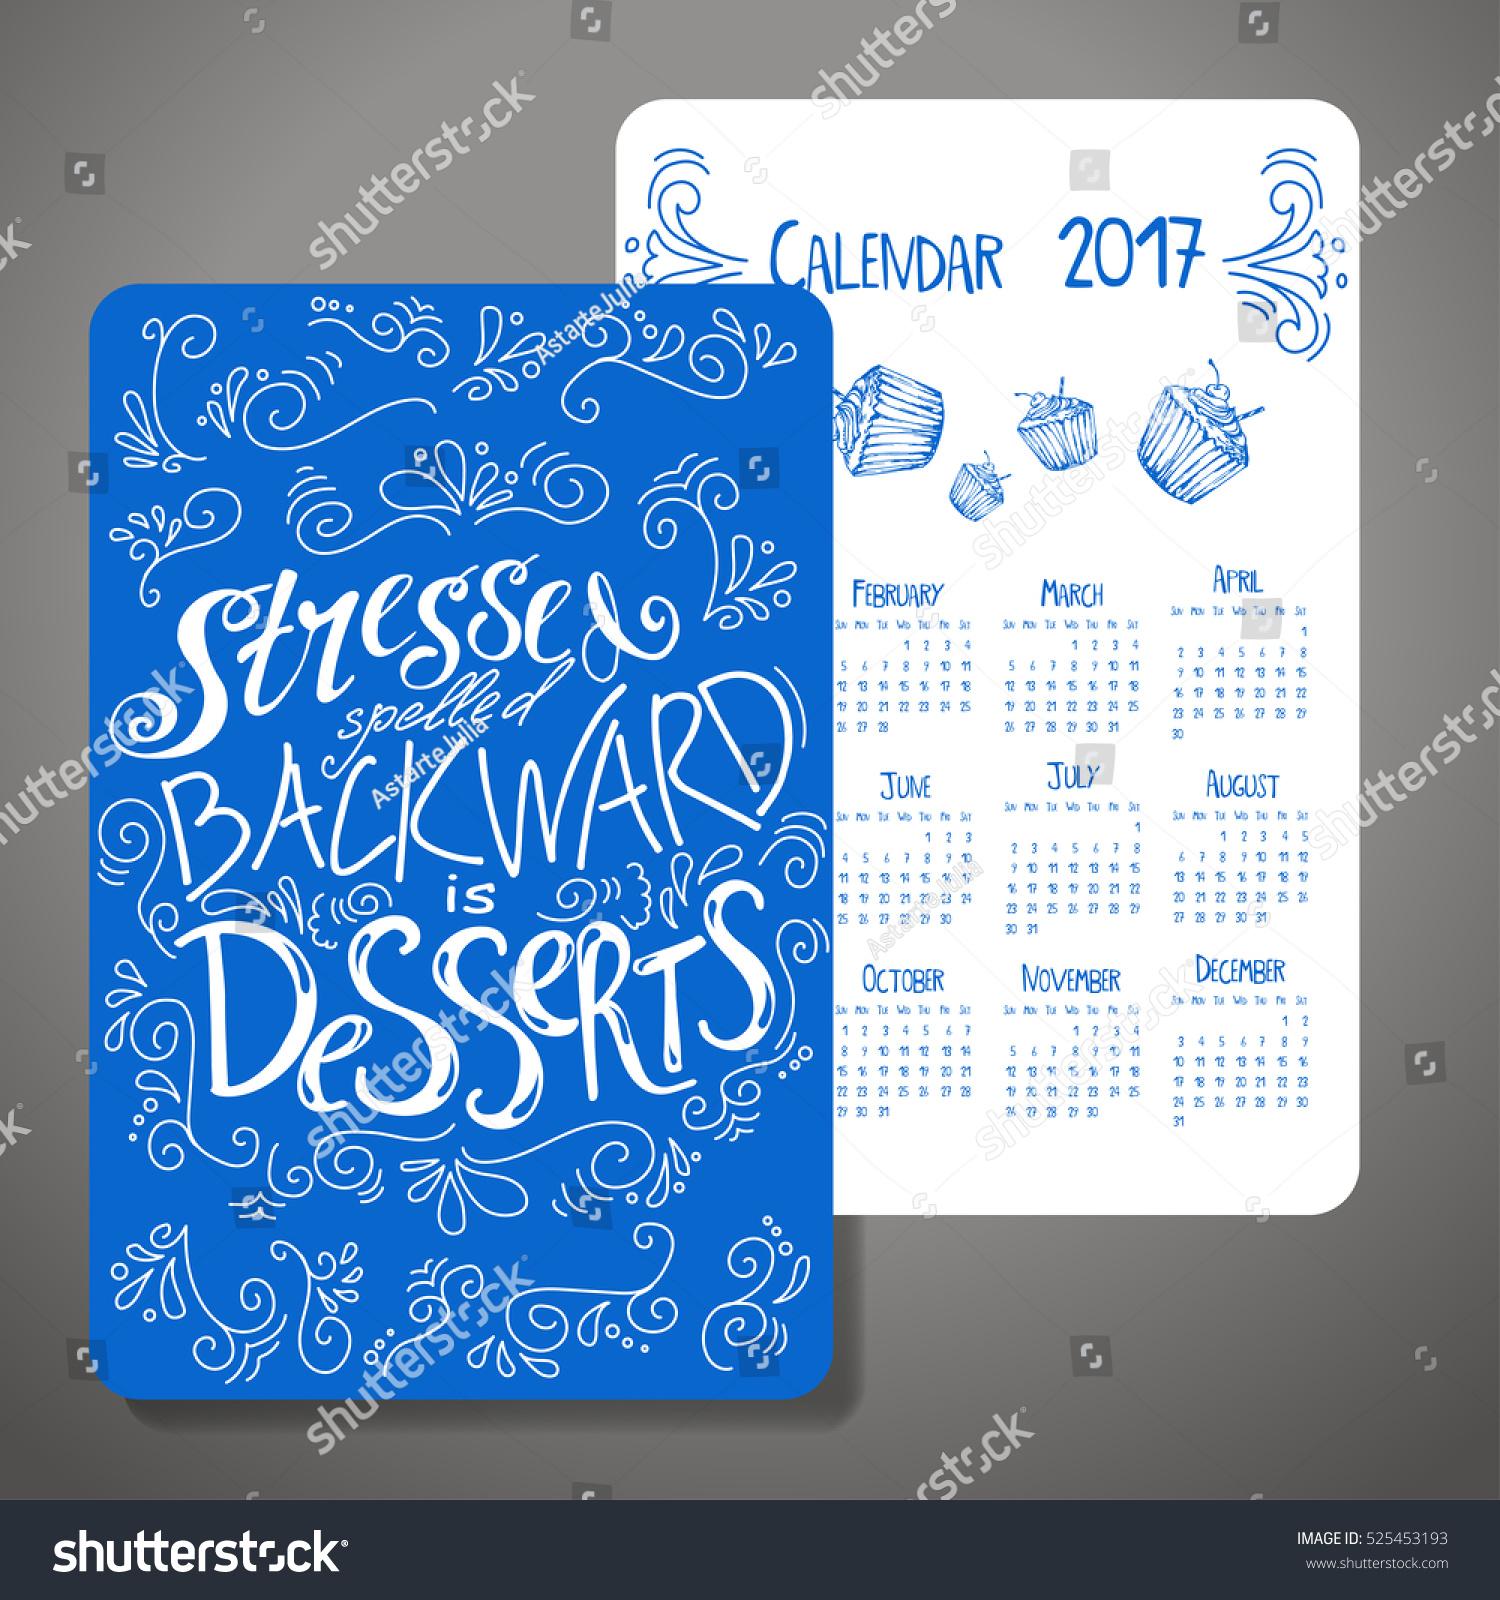 Calendar Design Quote : Vector calendar design motivational quote stock vector